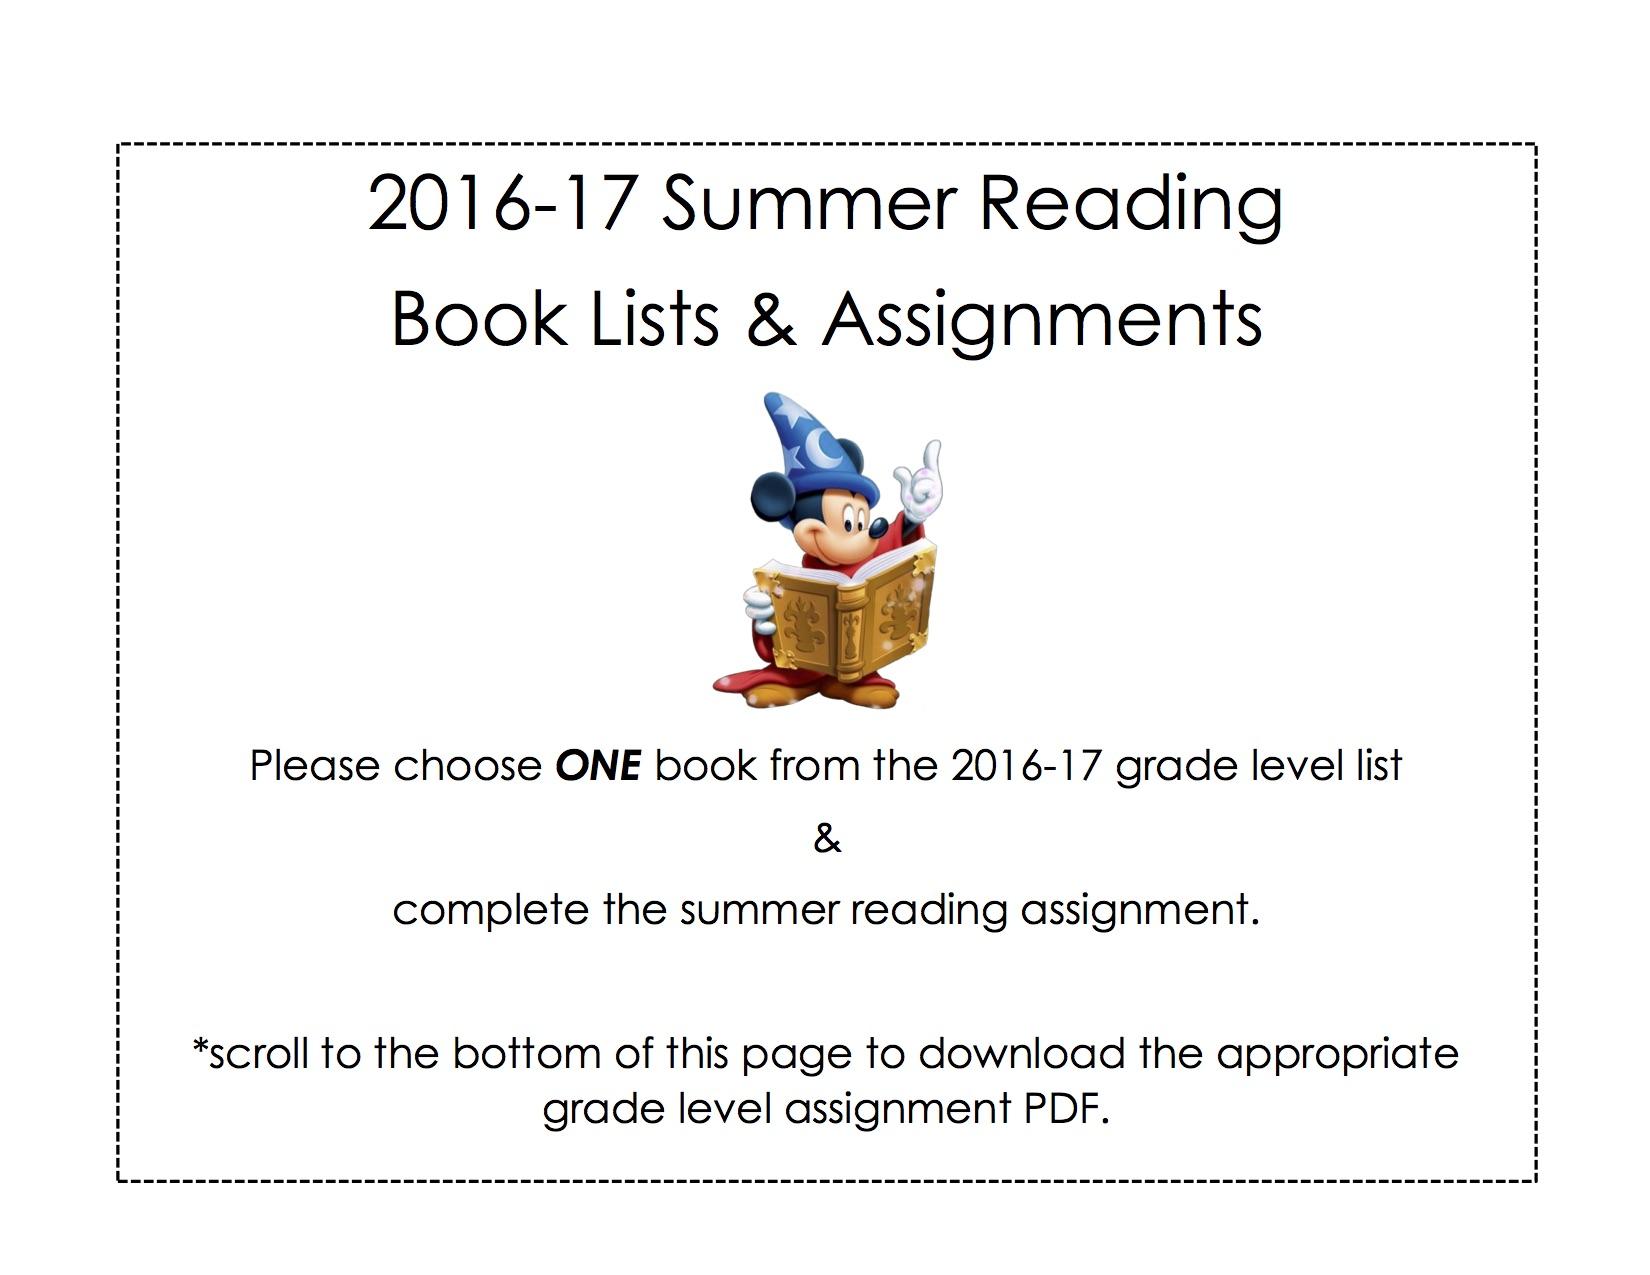 Summer Reading Assignment Summer Reading Assignment